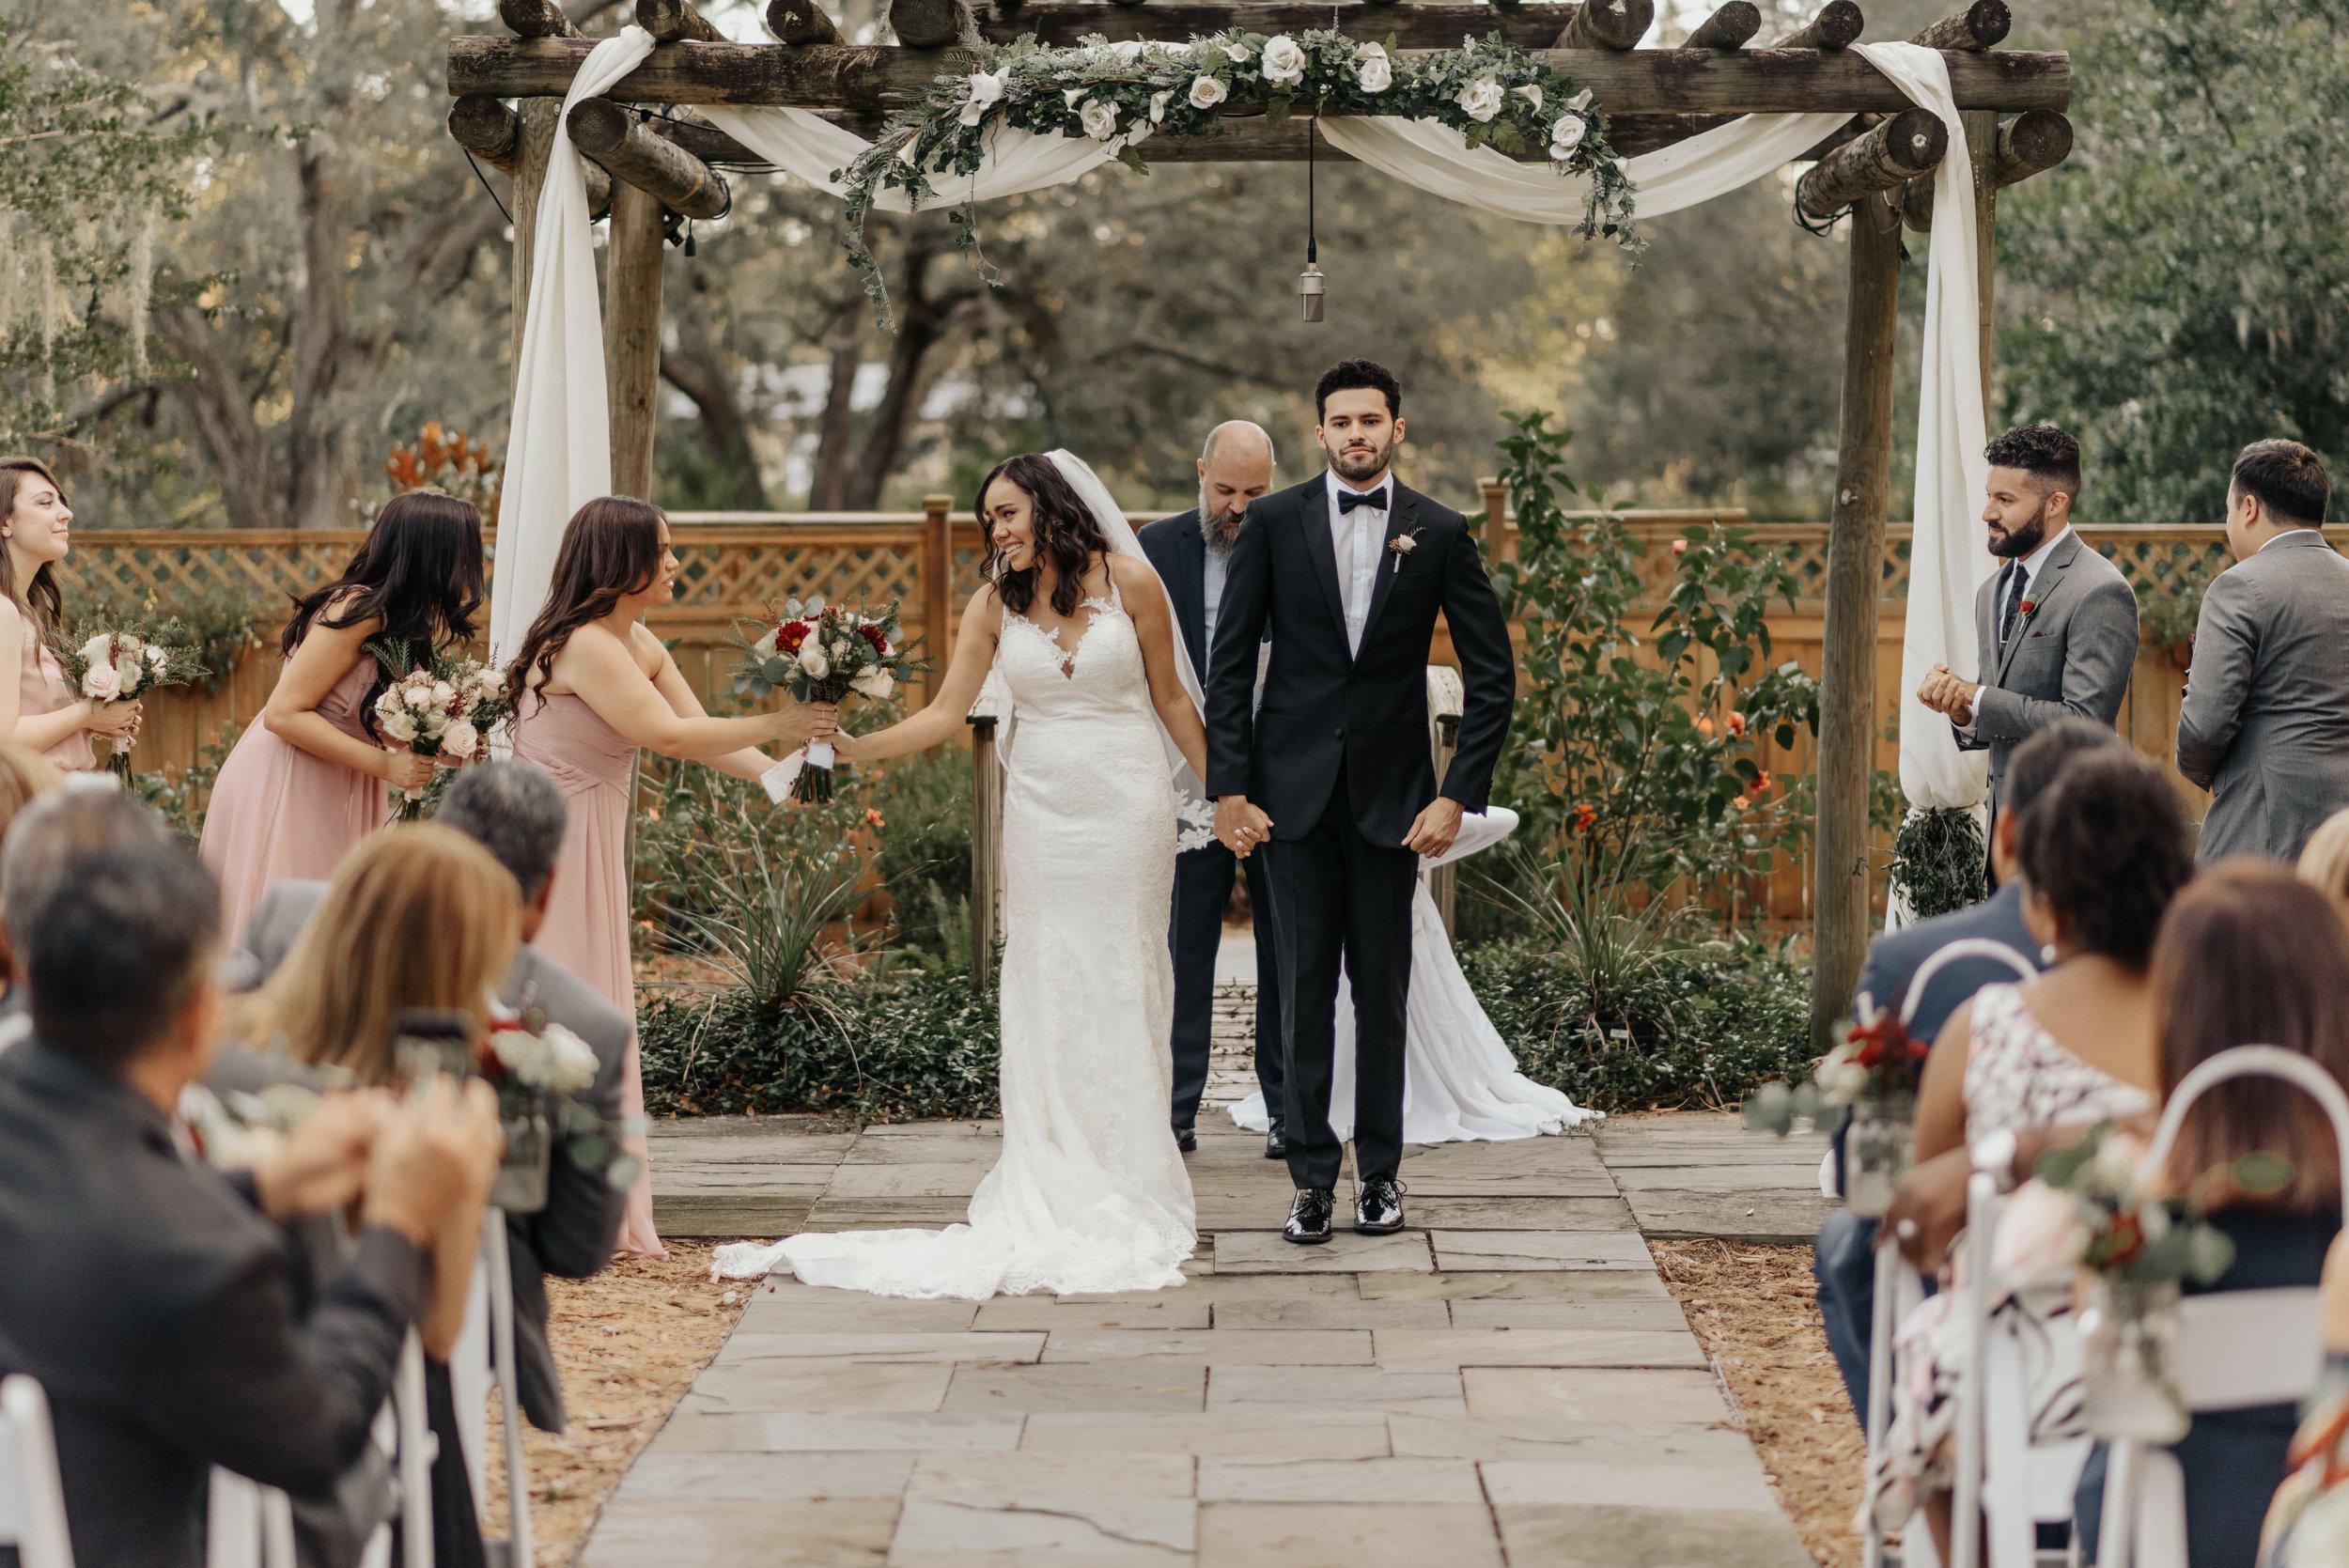 Kirstie-AJ-Wedding-0099.jpg